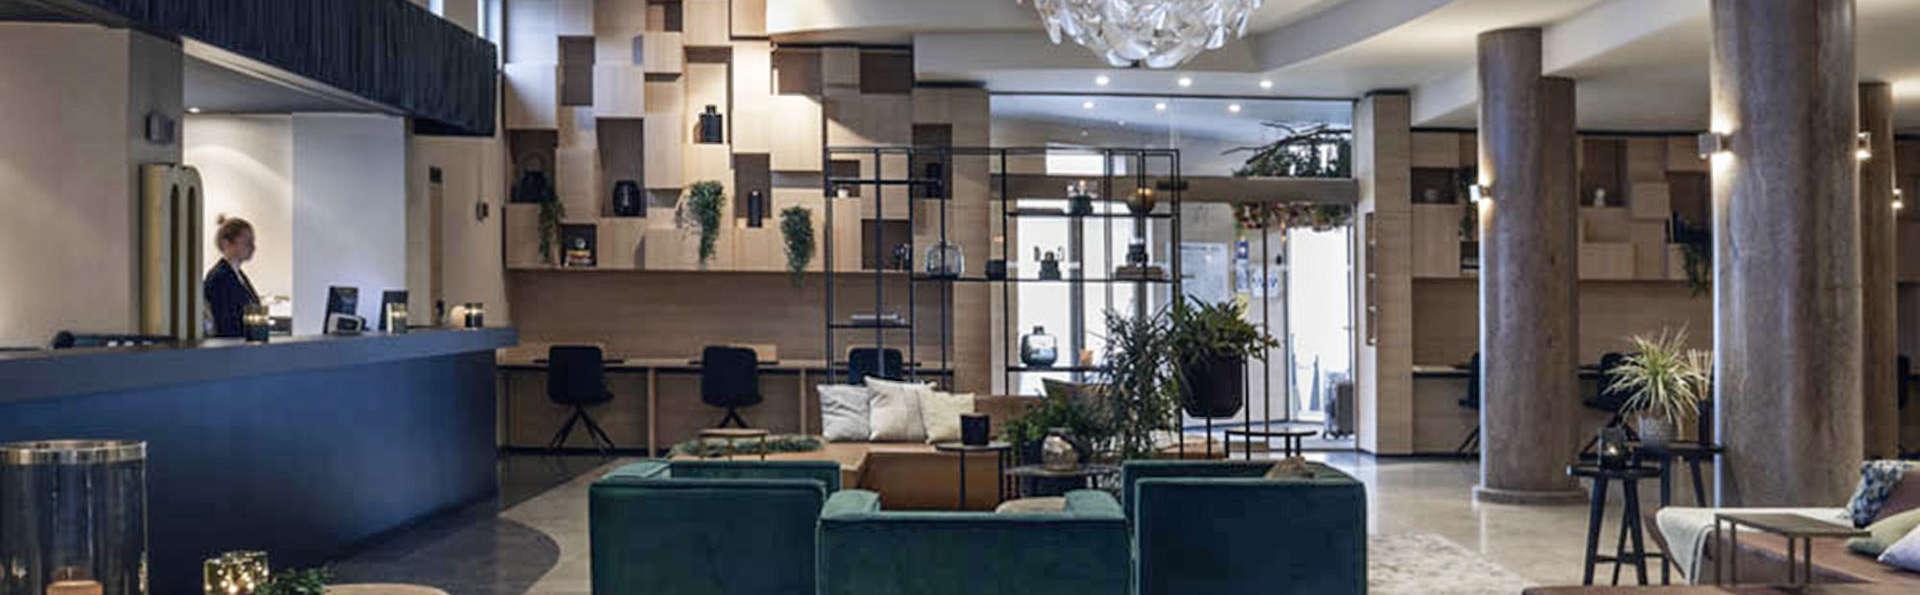 M Hotel - Different Hotels - EDIT_M-Hotel_Lobby_02__2_.jpg